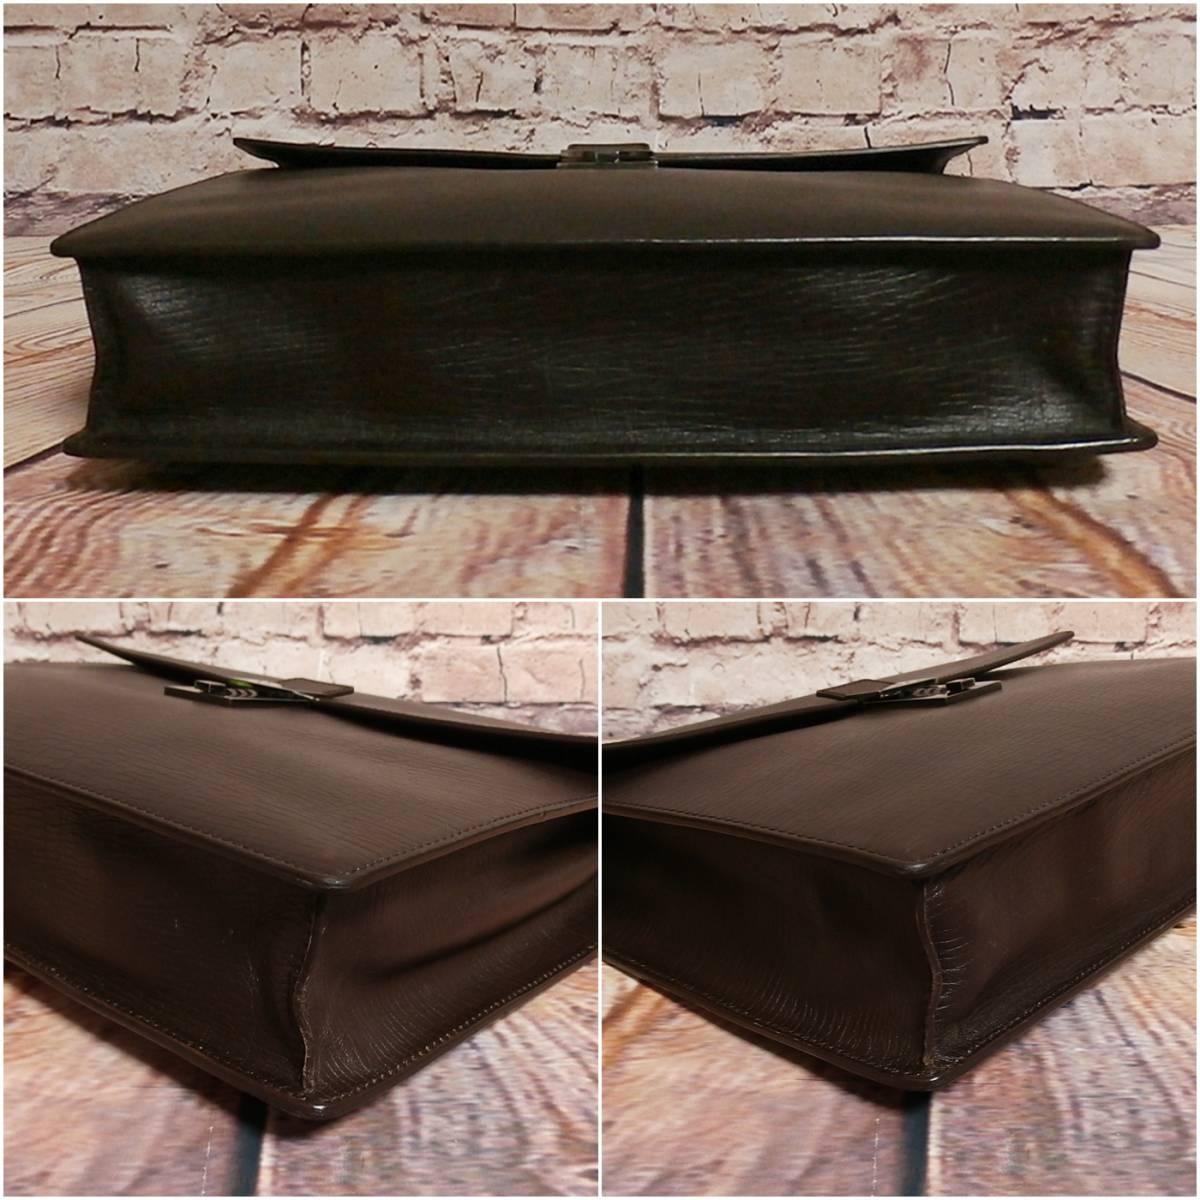 【GUCCI】 グッチ 良好 正規品 最高級 ◆ 本革 レザー ビジネスバッグ ブリーフケース 書類カバン 書類鞄_画像5